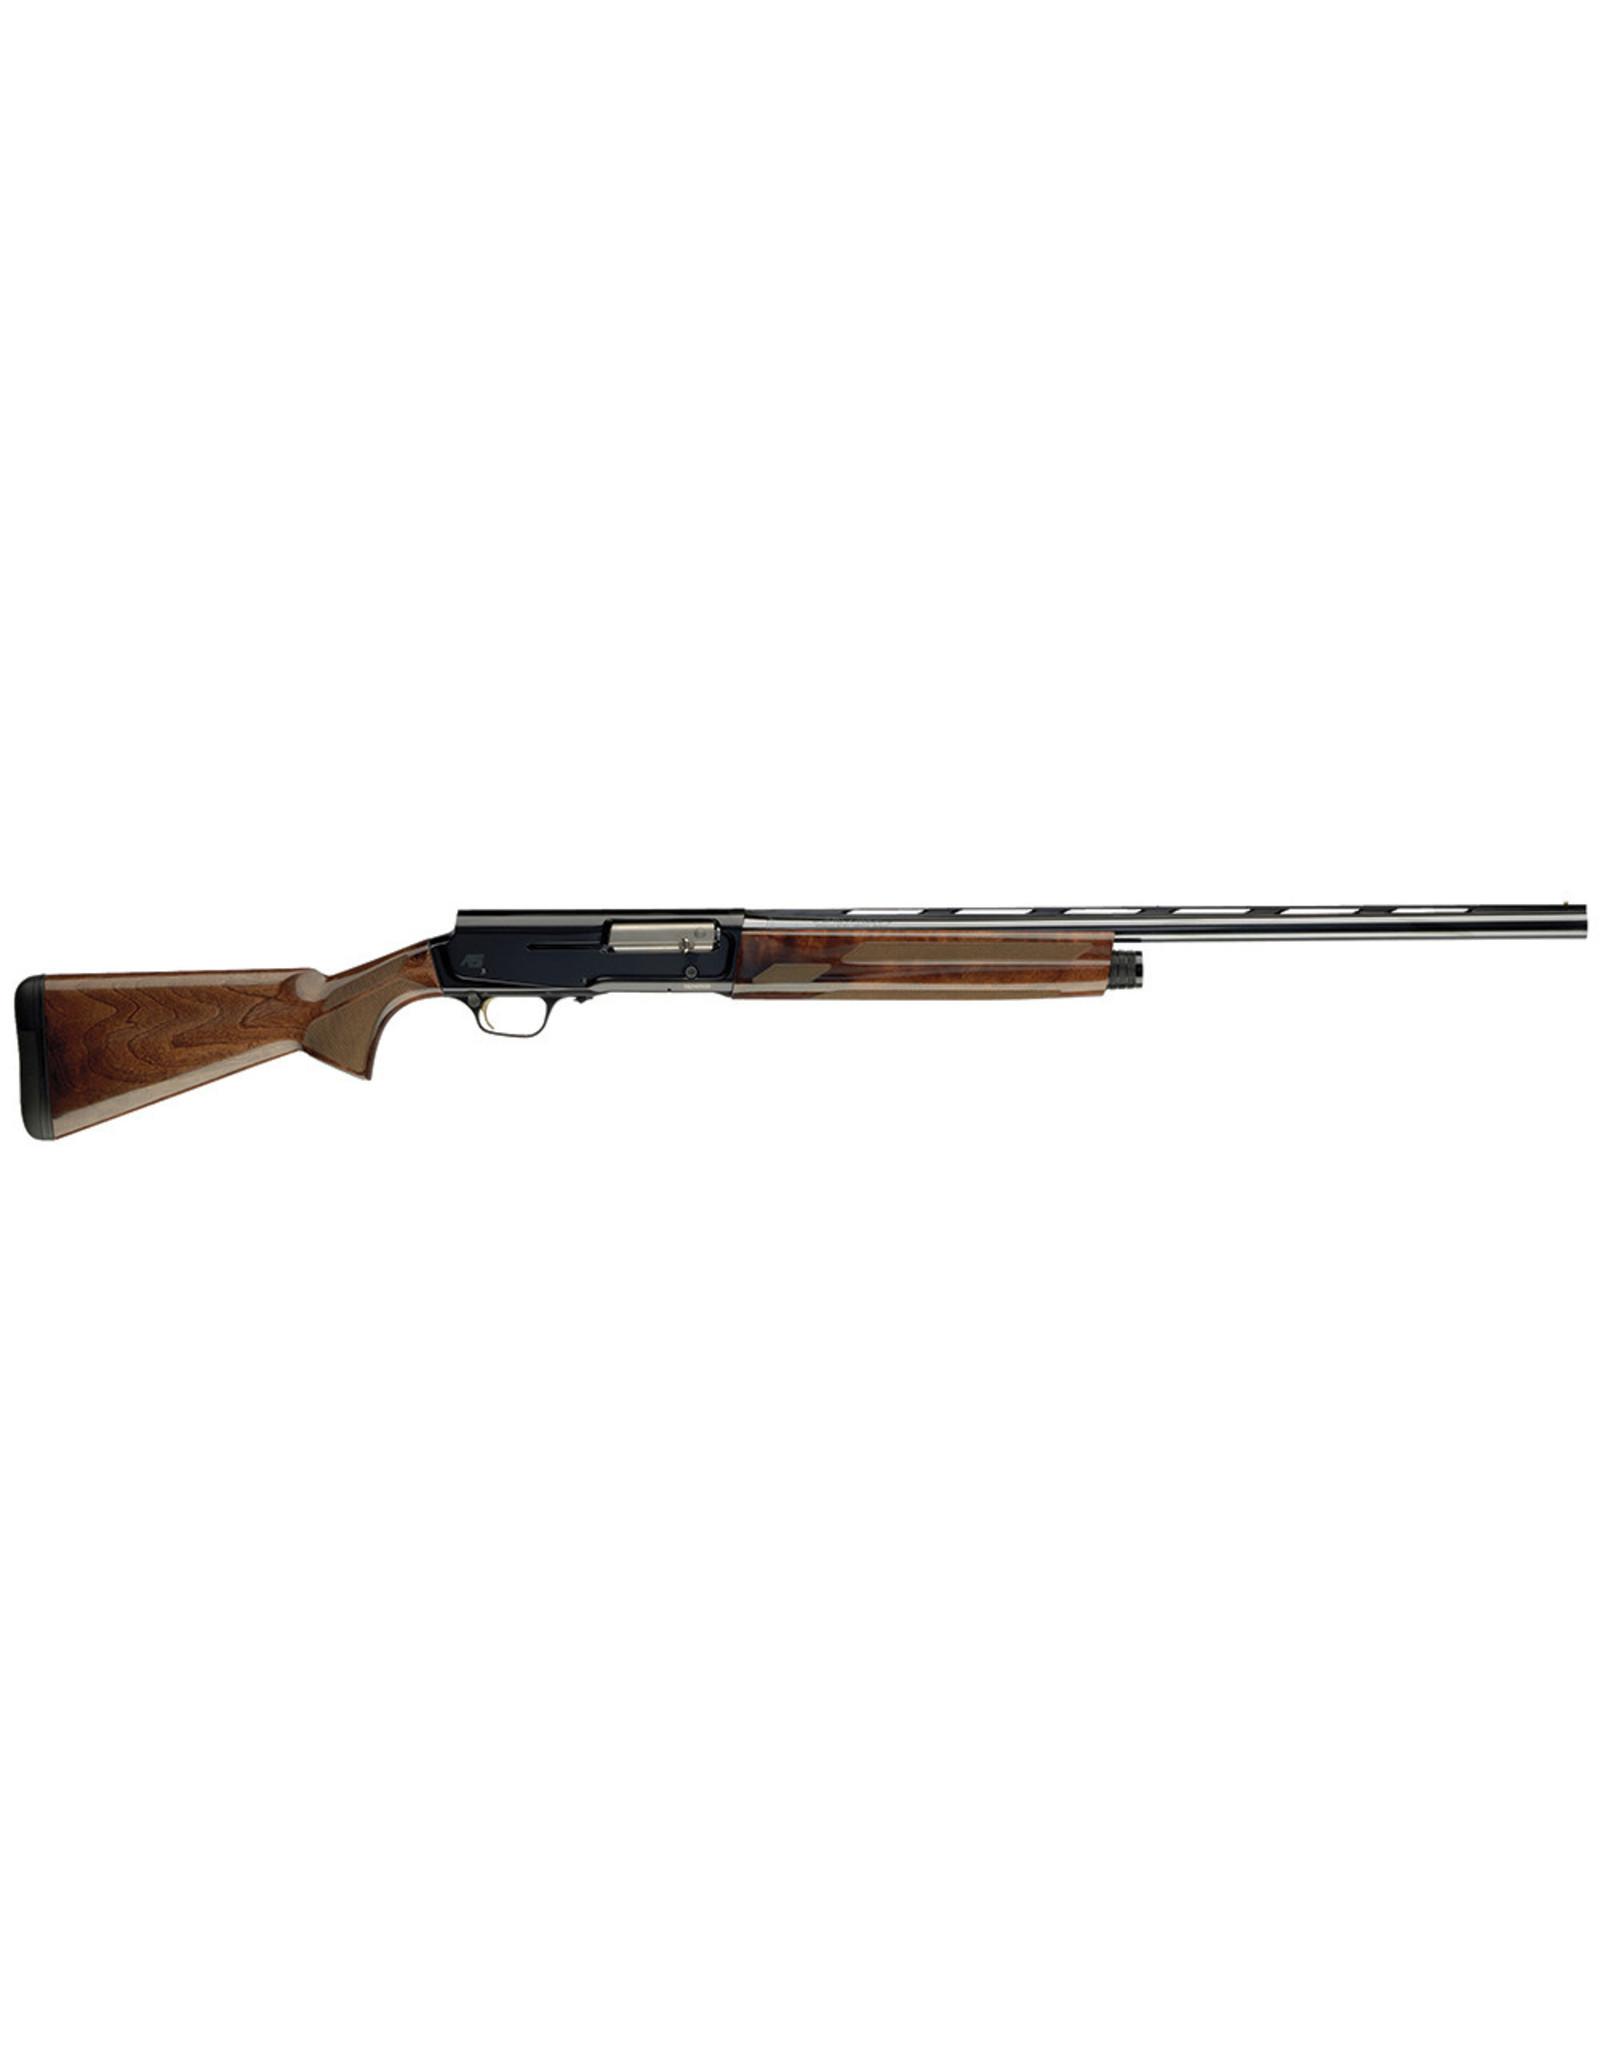 "Browning Browning A5 Hunter 12 ga 3"" Chamber 26"" bbl"